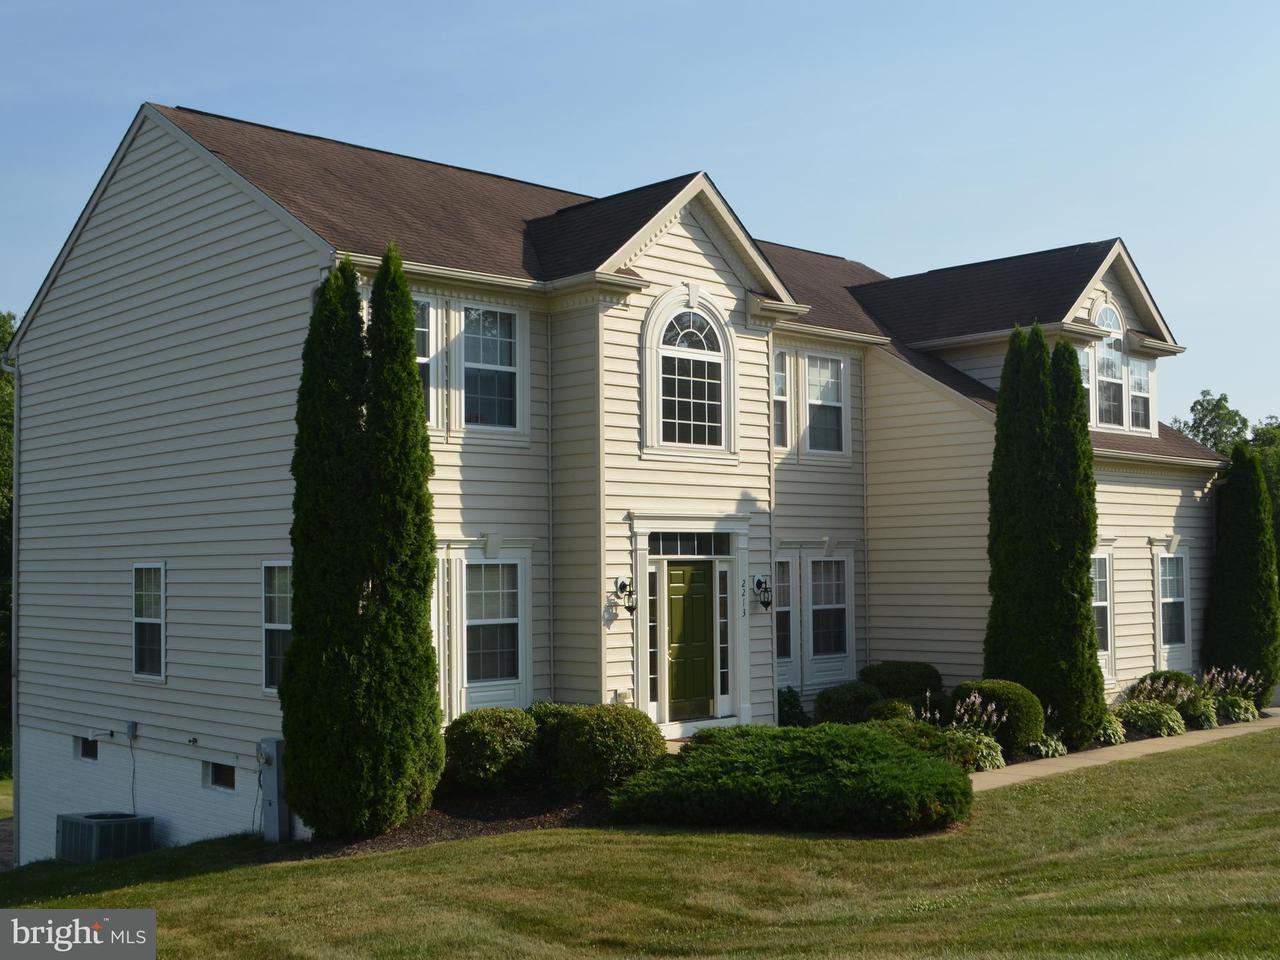 Casa Unifamiliar por un Venta en 2213 River Bend Court 2213 River Bend Court White Hall, Maryland 21161 Estados Unidos